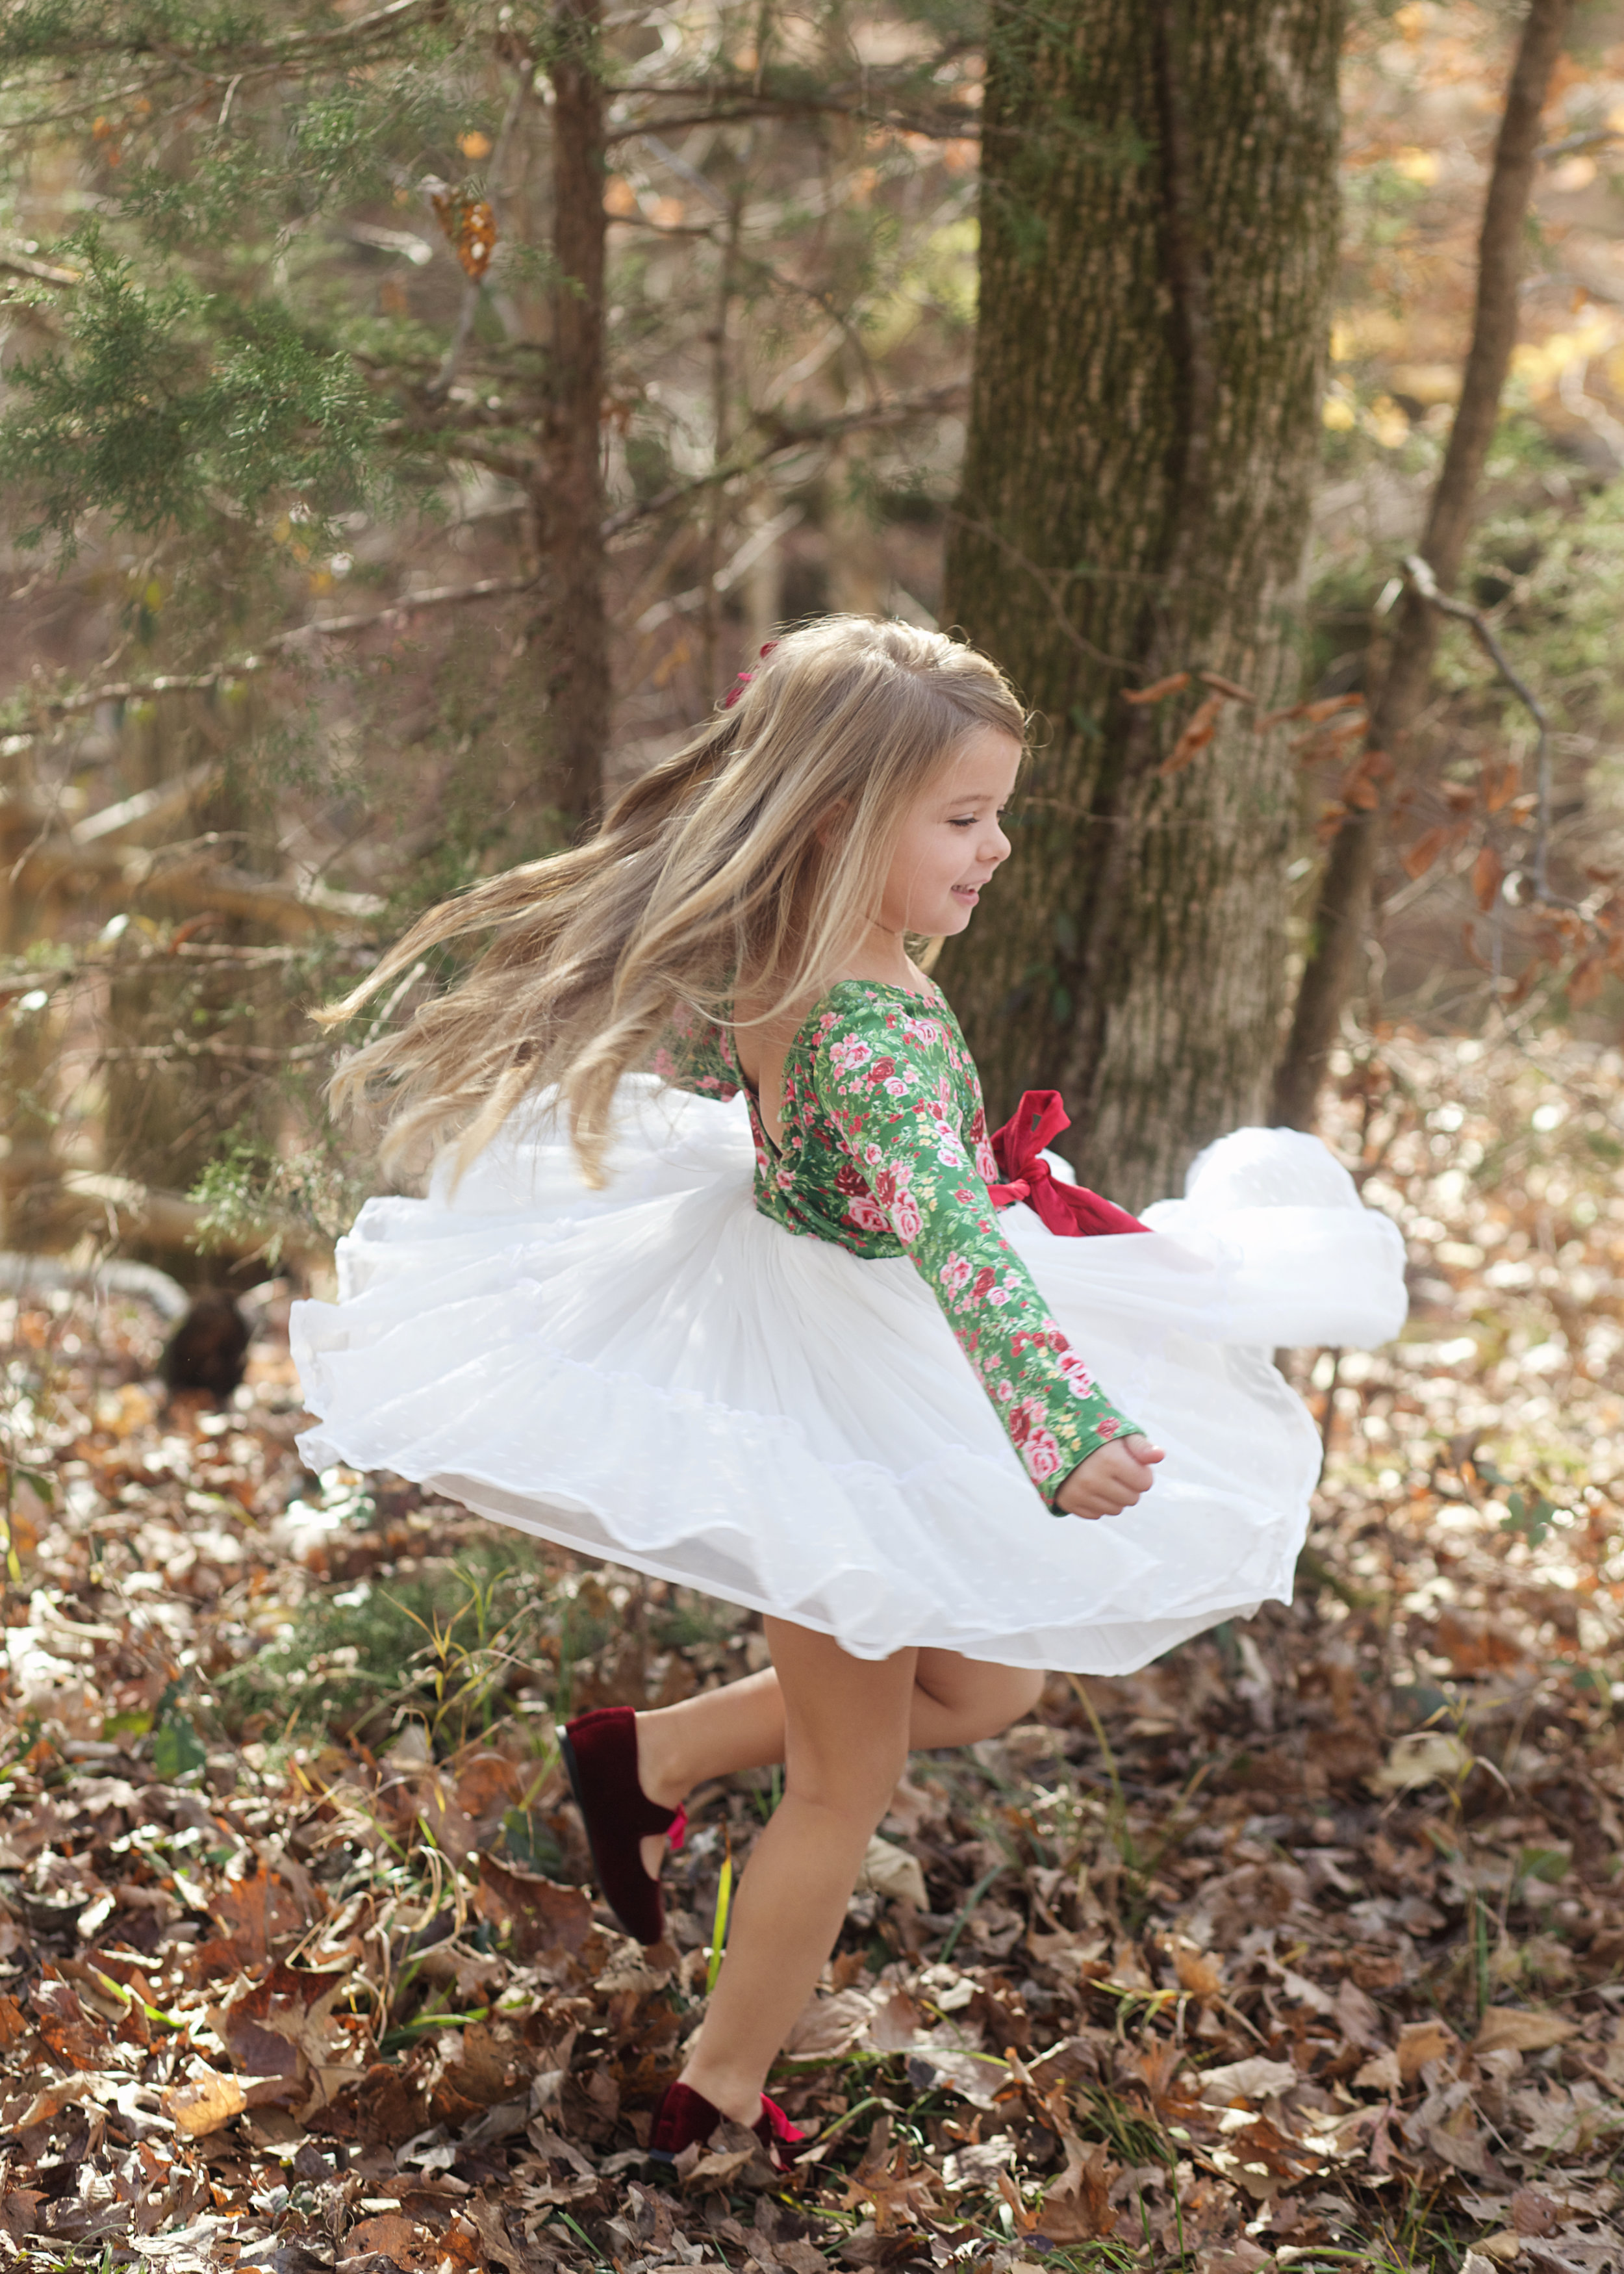 Itwirly-twirly-dress.jpg